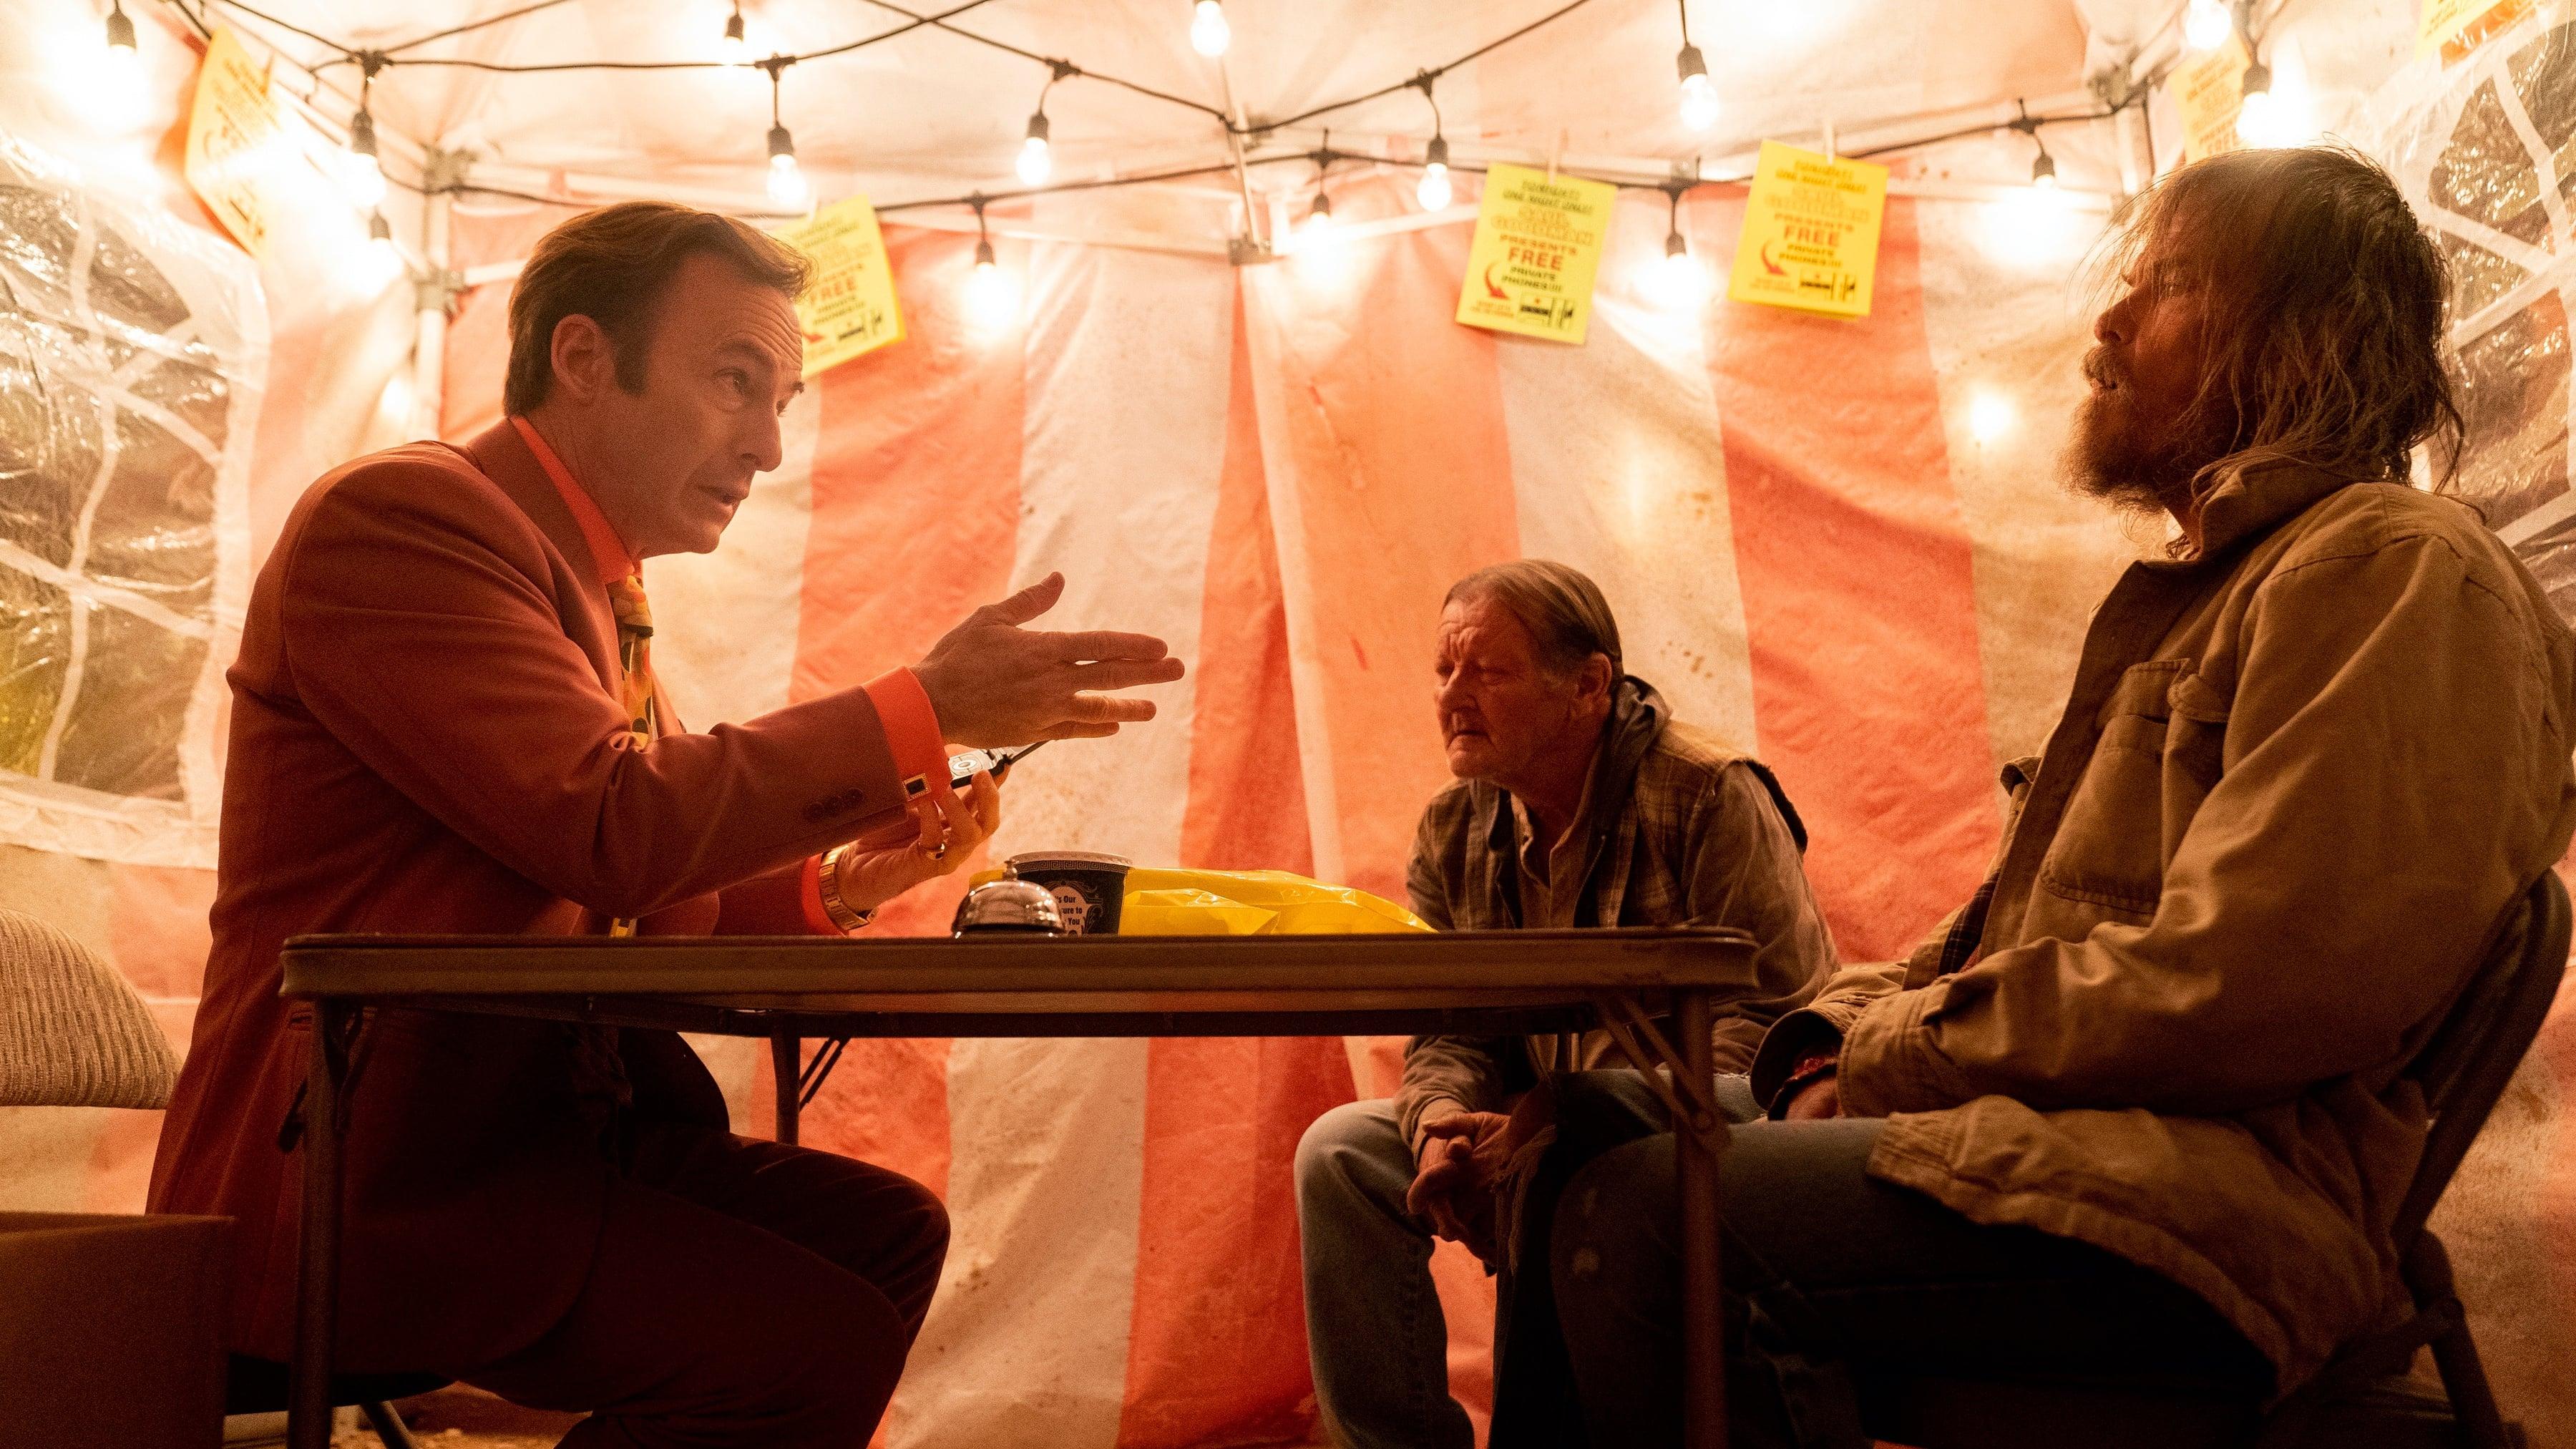 Better Call Saul - Season 5 Episode 1 : Magic Man